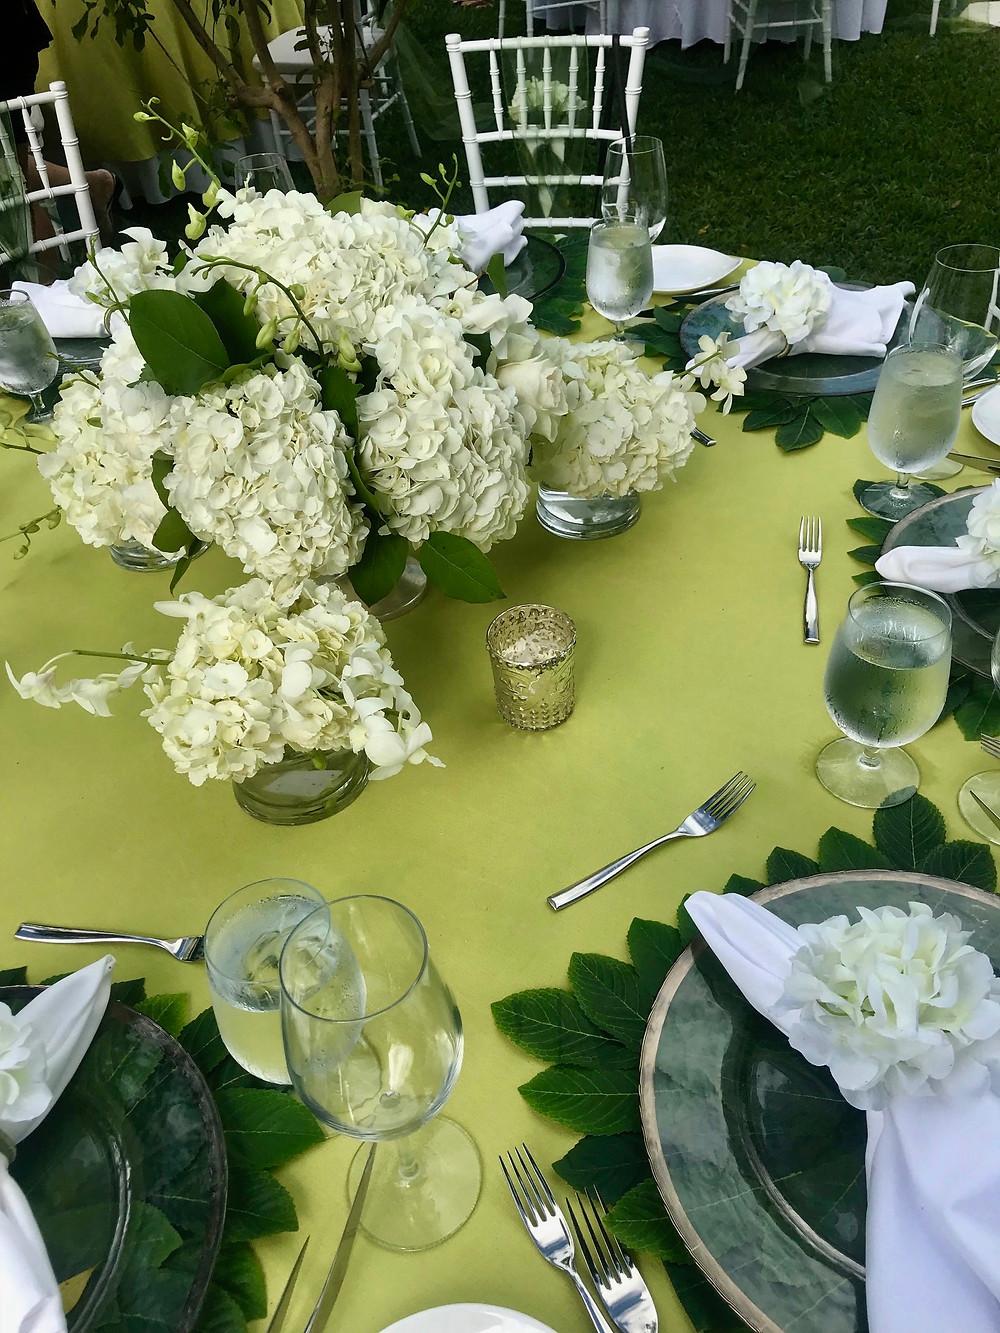 Outdoor reception at Sandals Royal Barbados - centerpiece detail